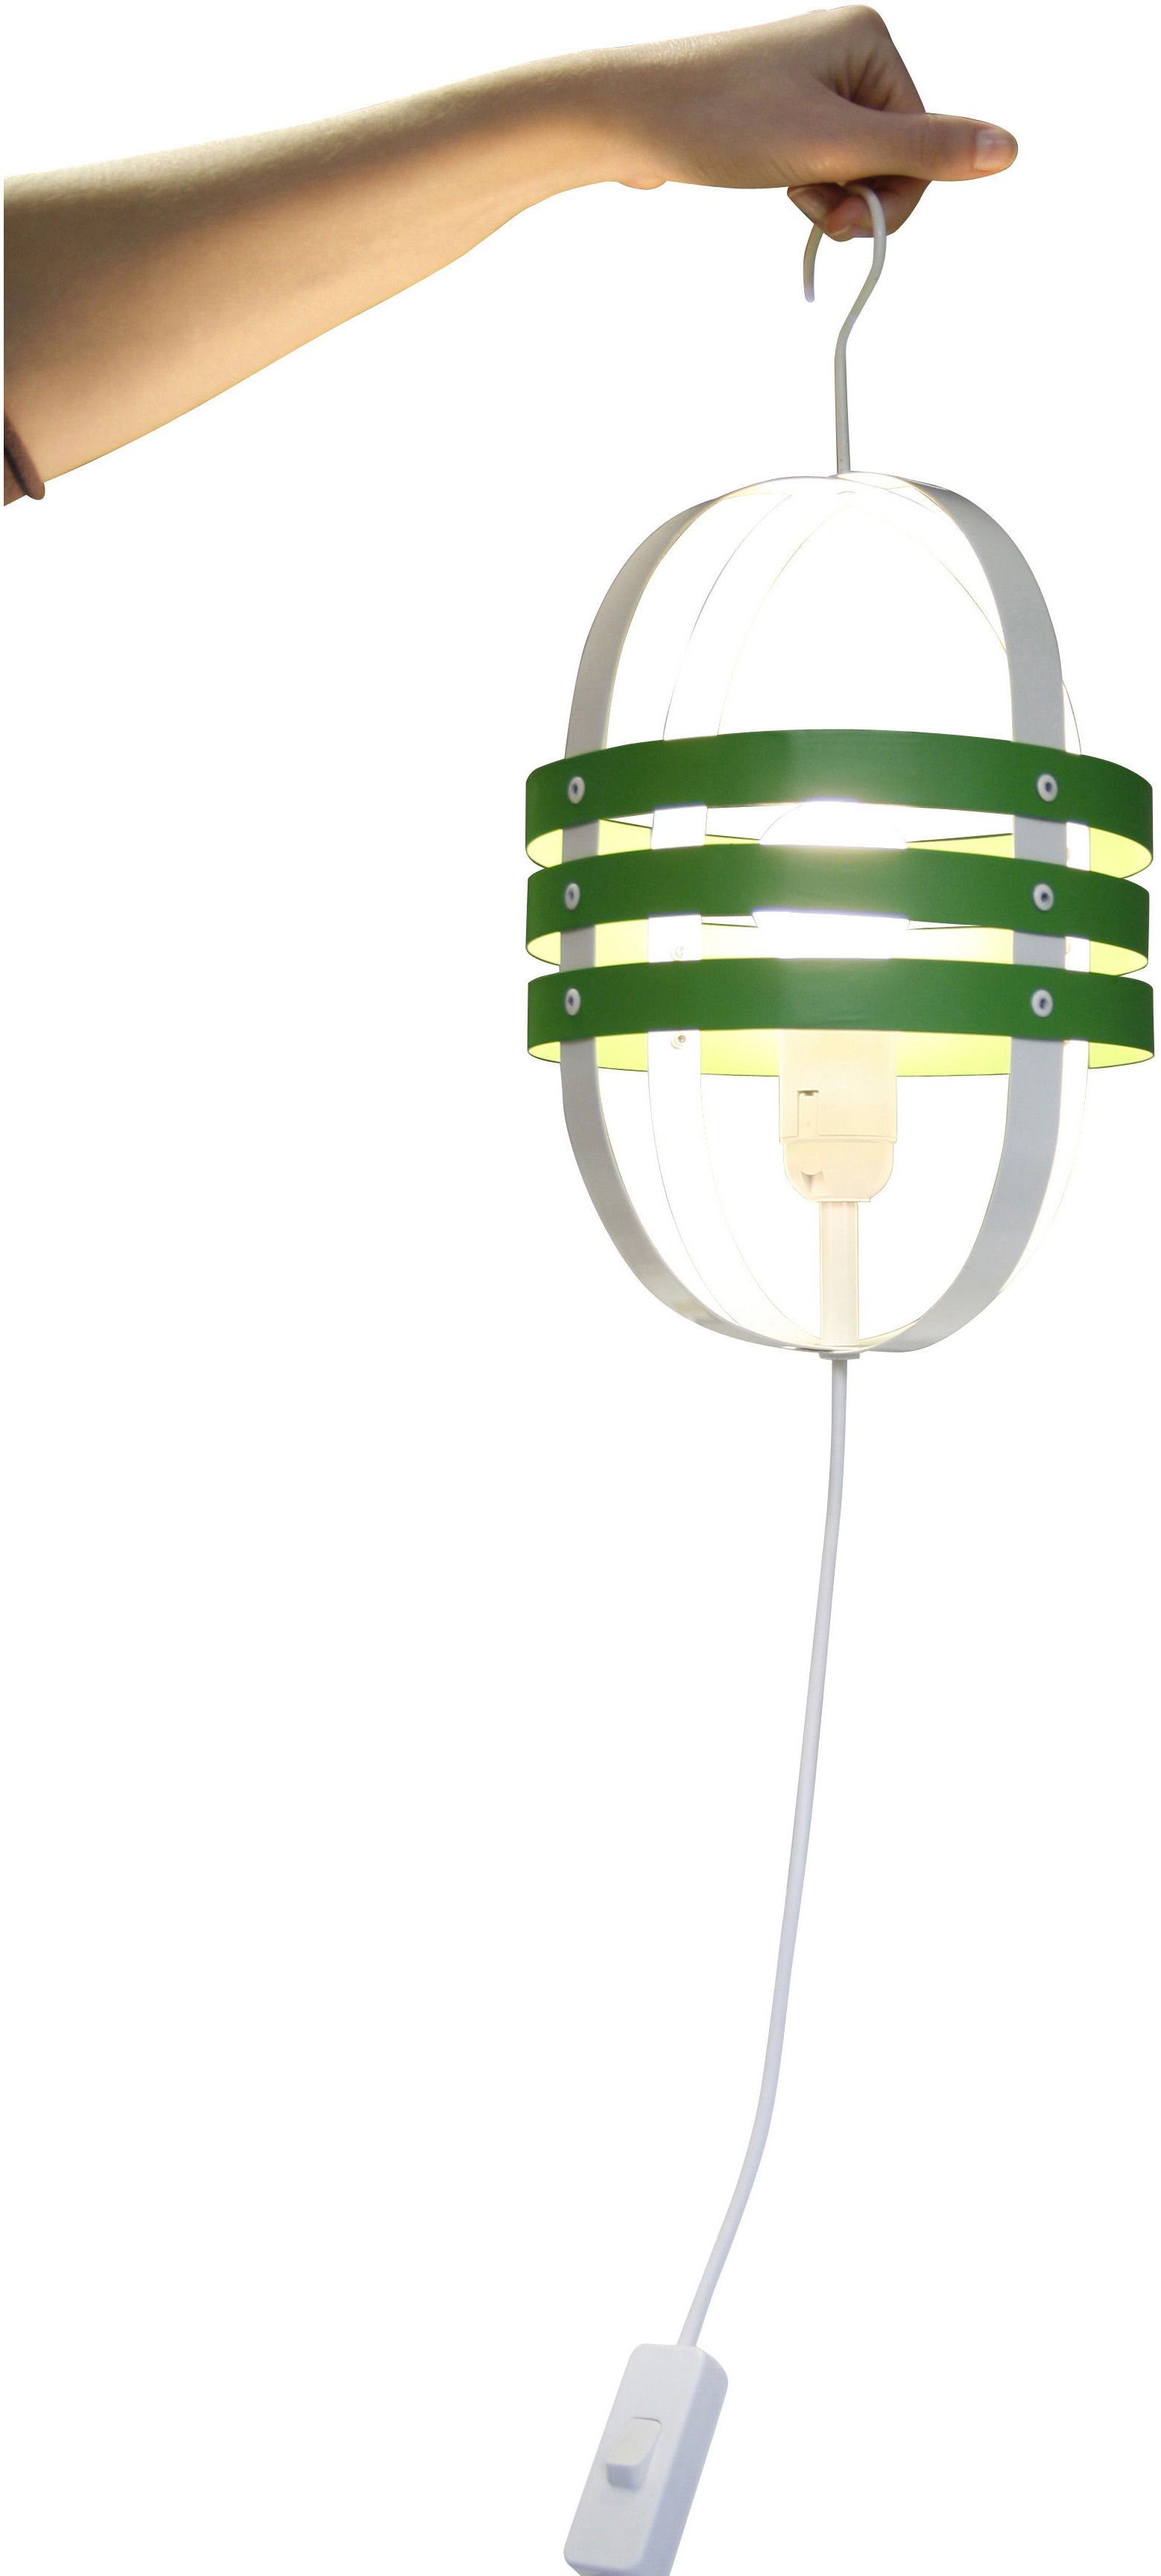 r miniscence lampe handlampe mit haken gr n by made in design editions made in design. Black Bedroom Furniture Sets. Home Design Ideas